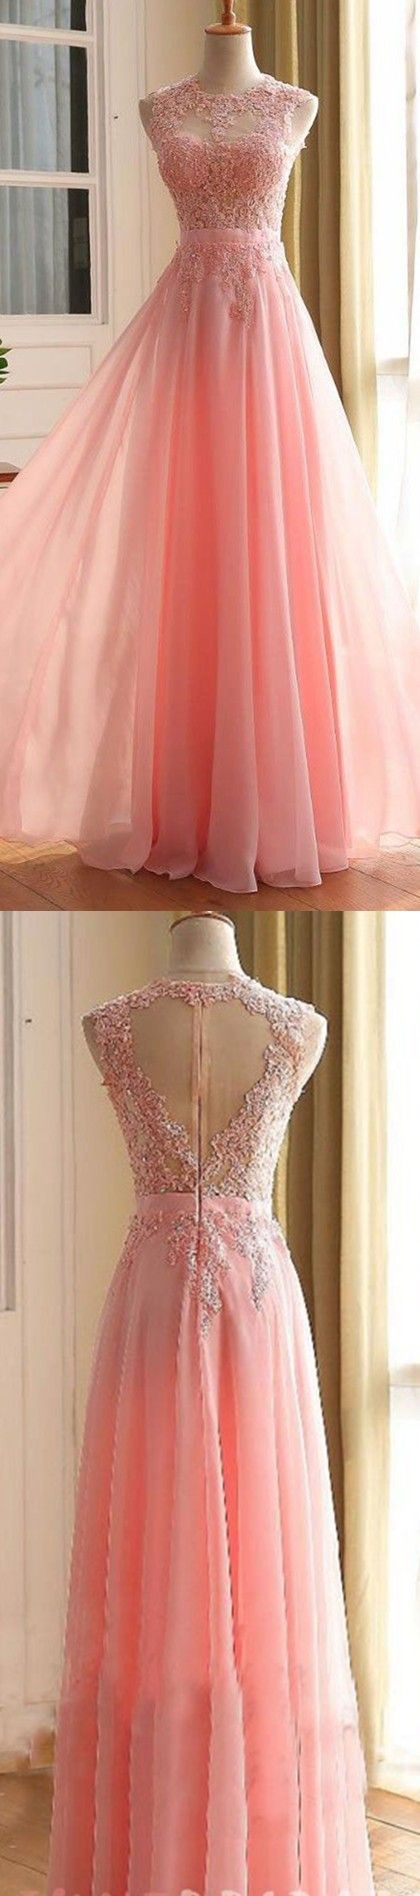 best dresses images on pinterest classy dress long prom